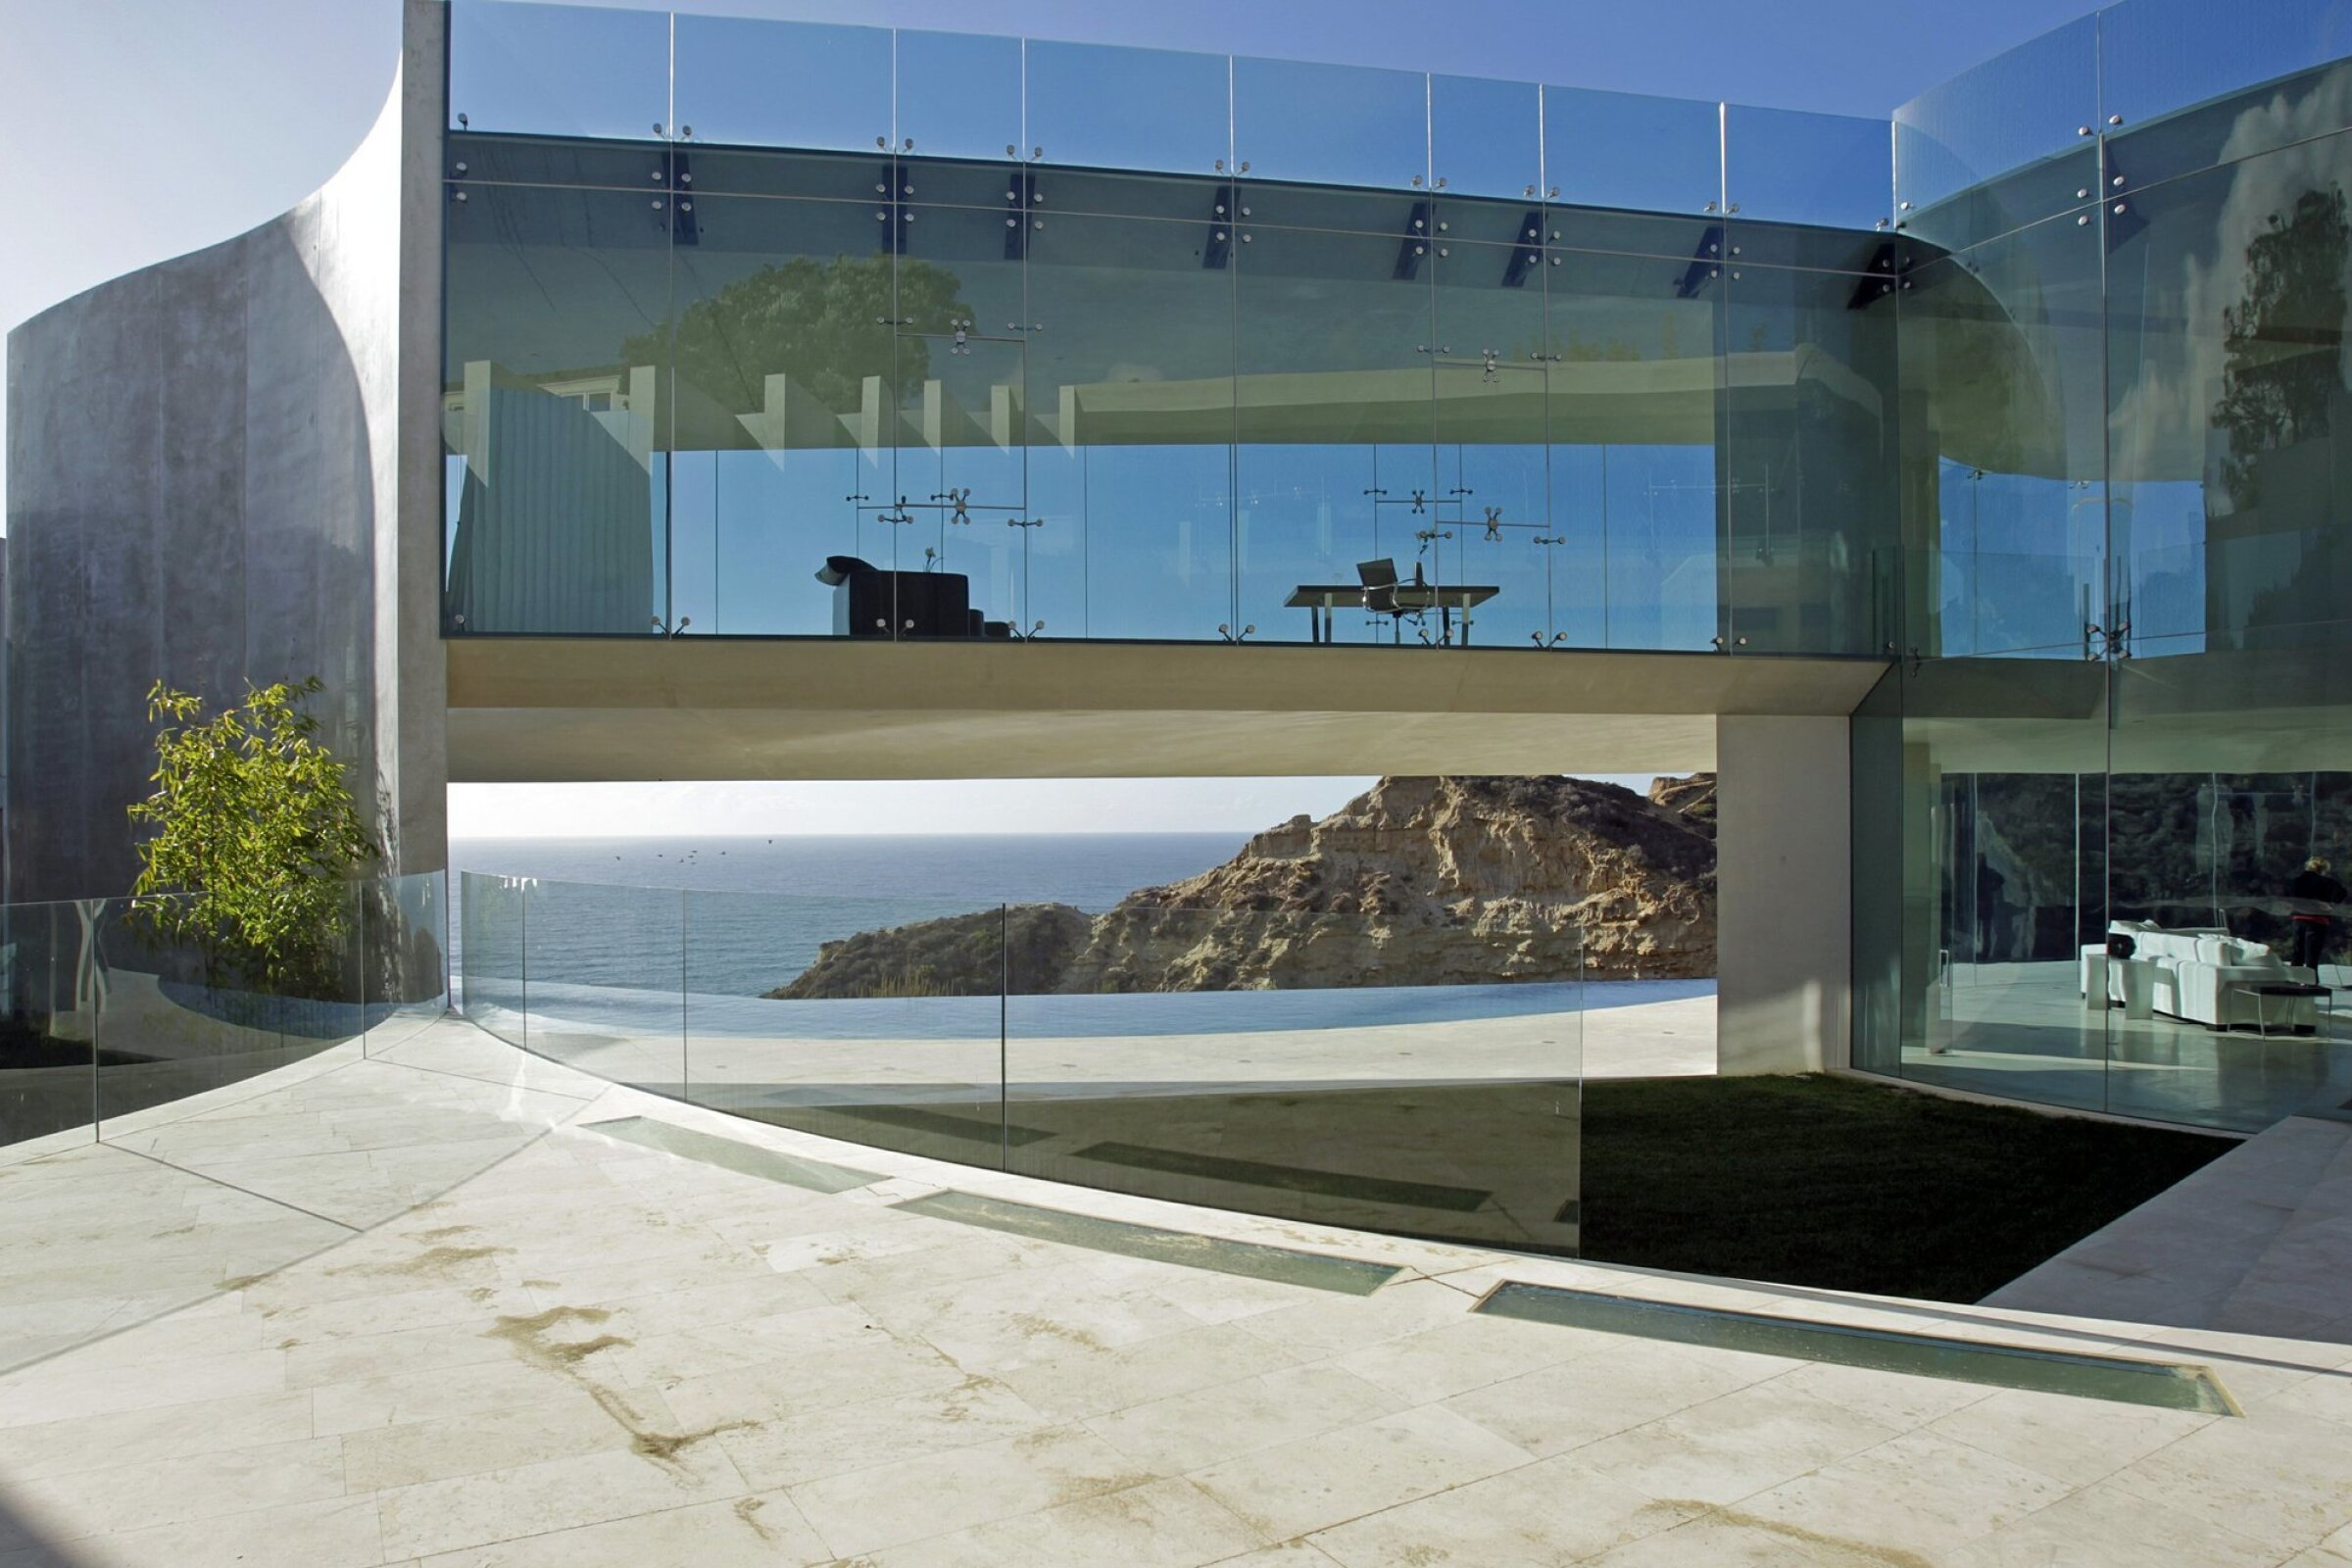 The Razor House in La Jolla sold for $20.8 million in August.